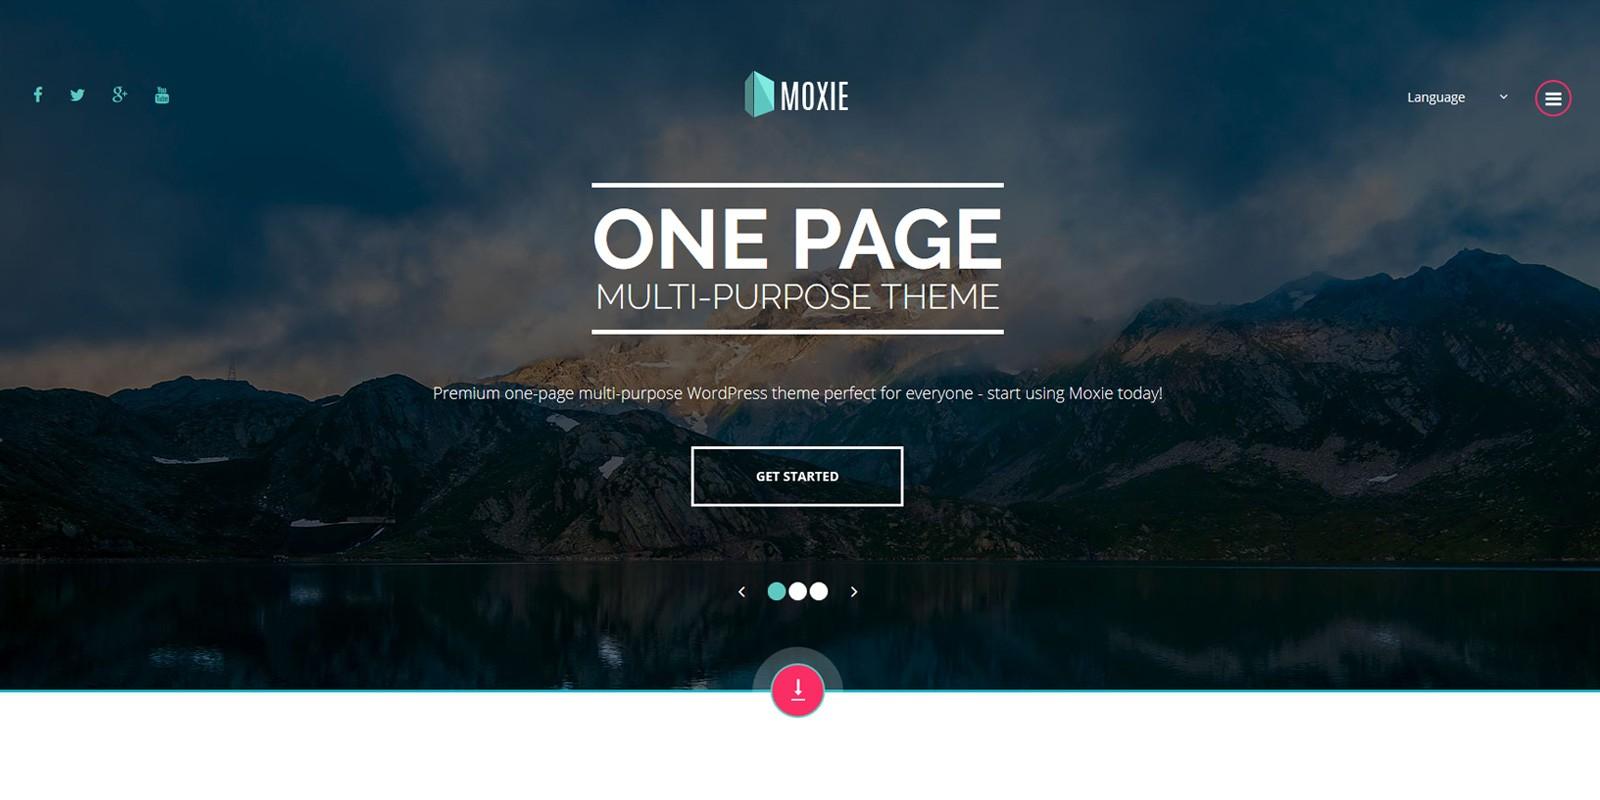 ThemeForest Construct v Multi-Purpose WordPress Theme - Code Listz